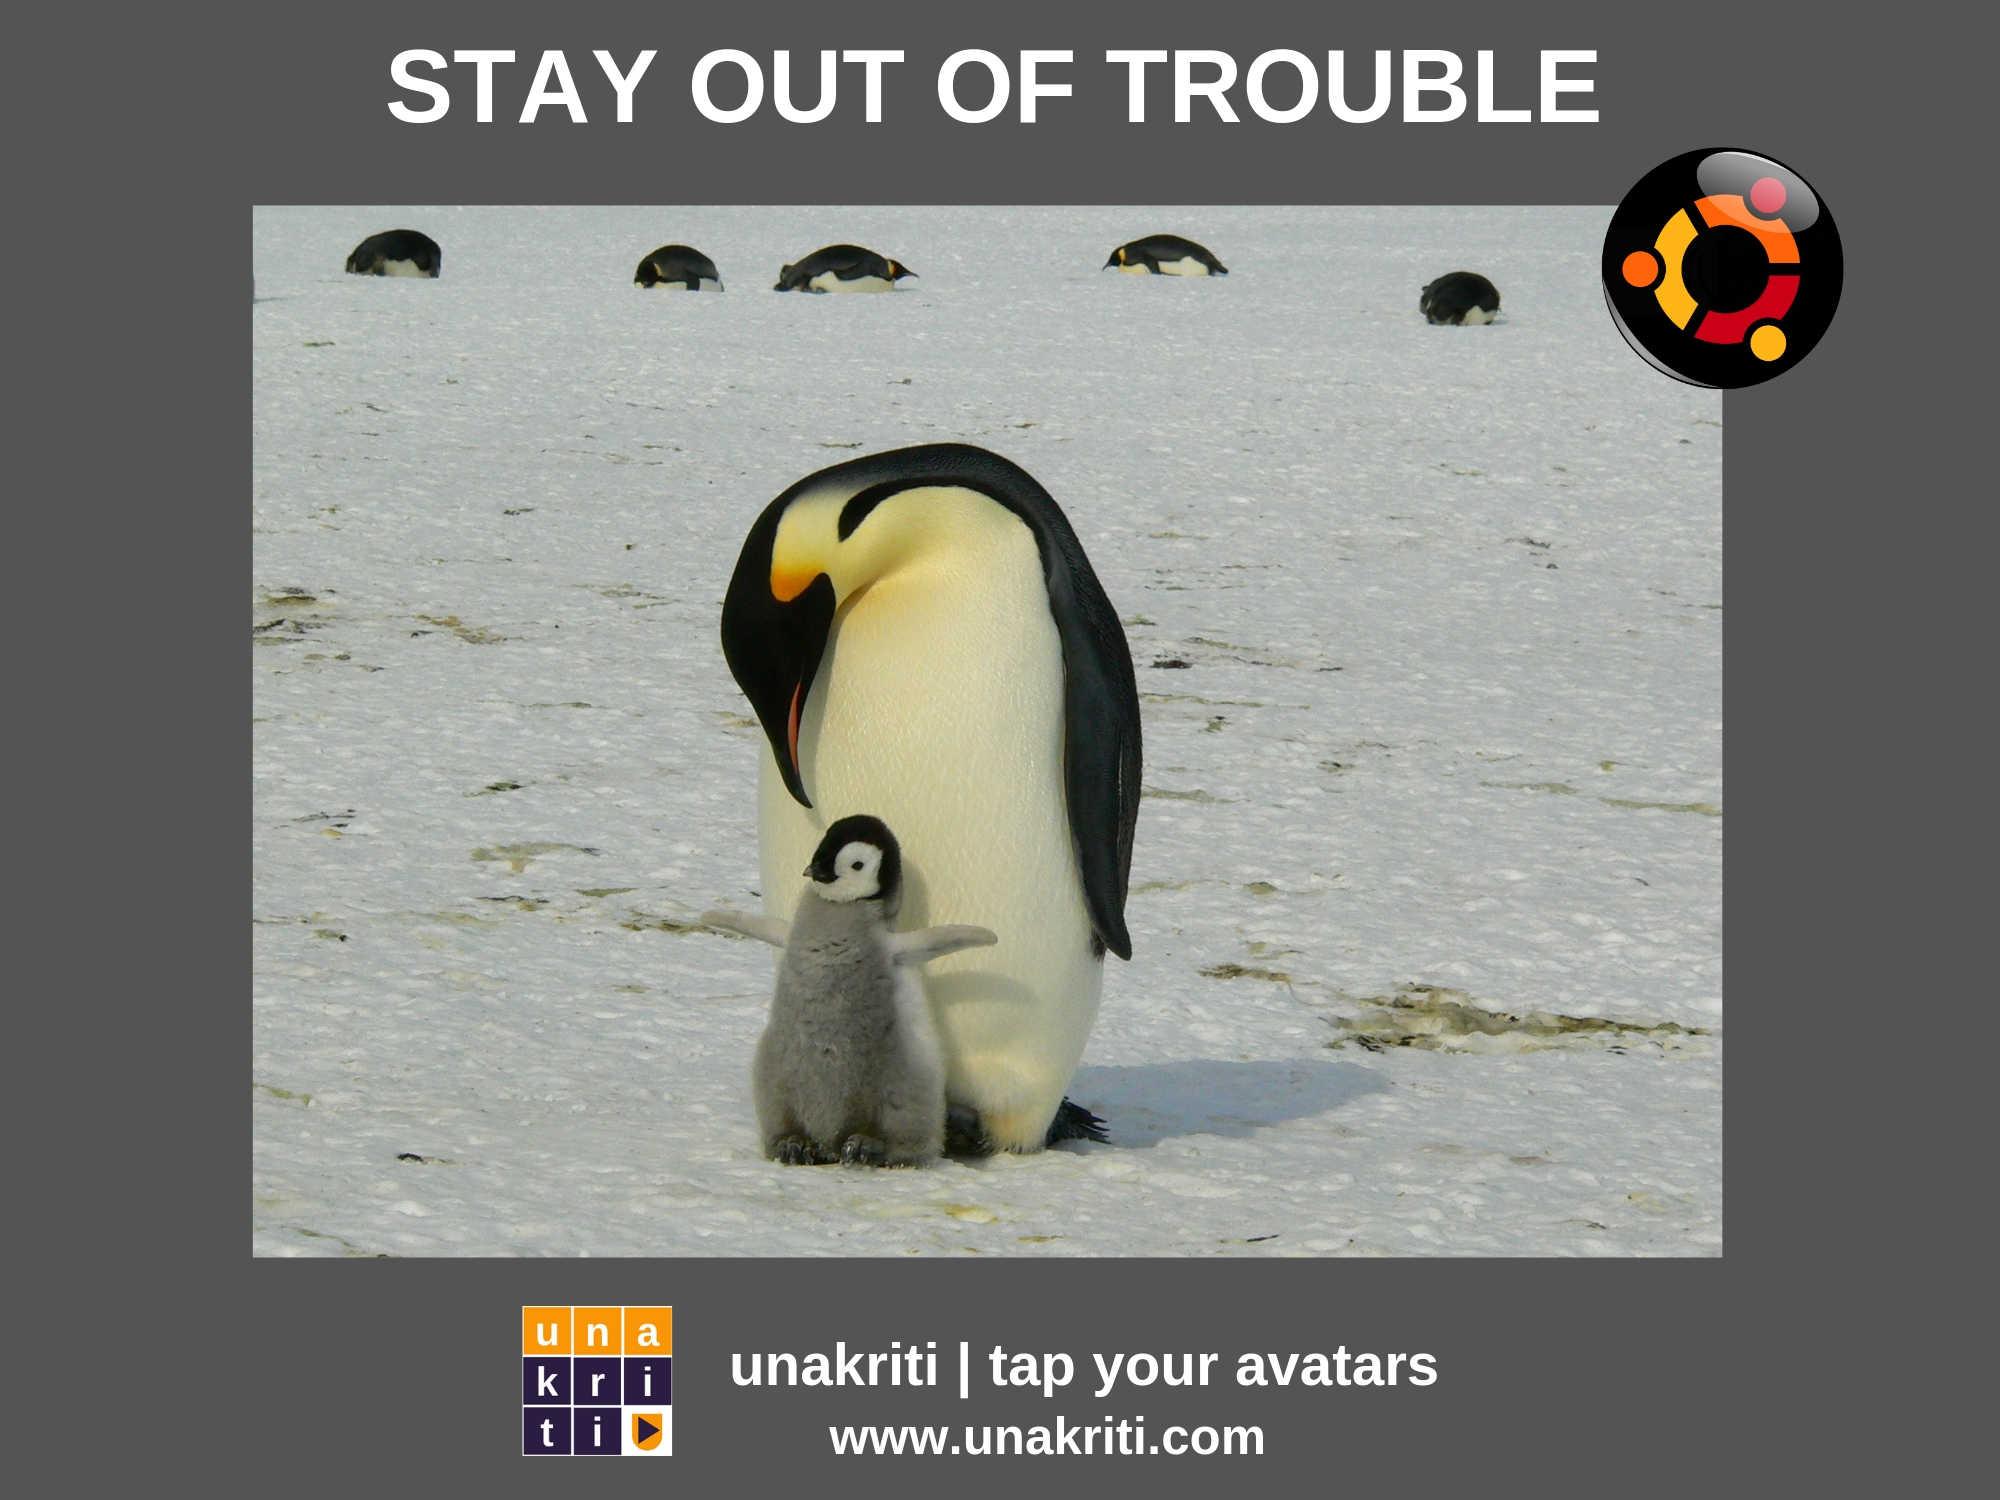 Is Ubuntu safe to use?